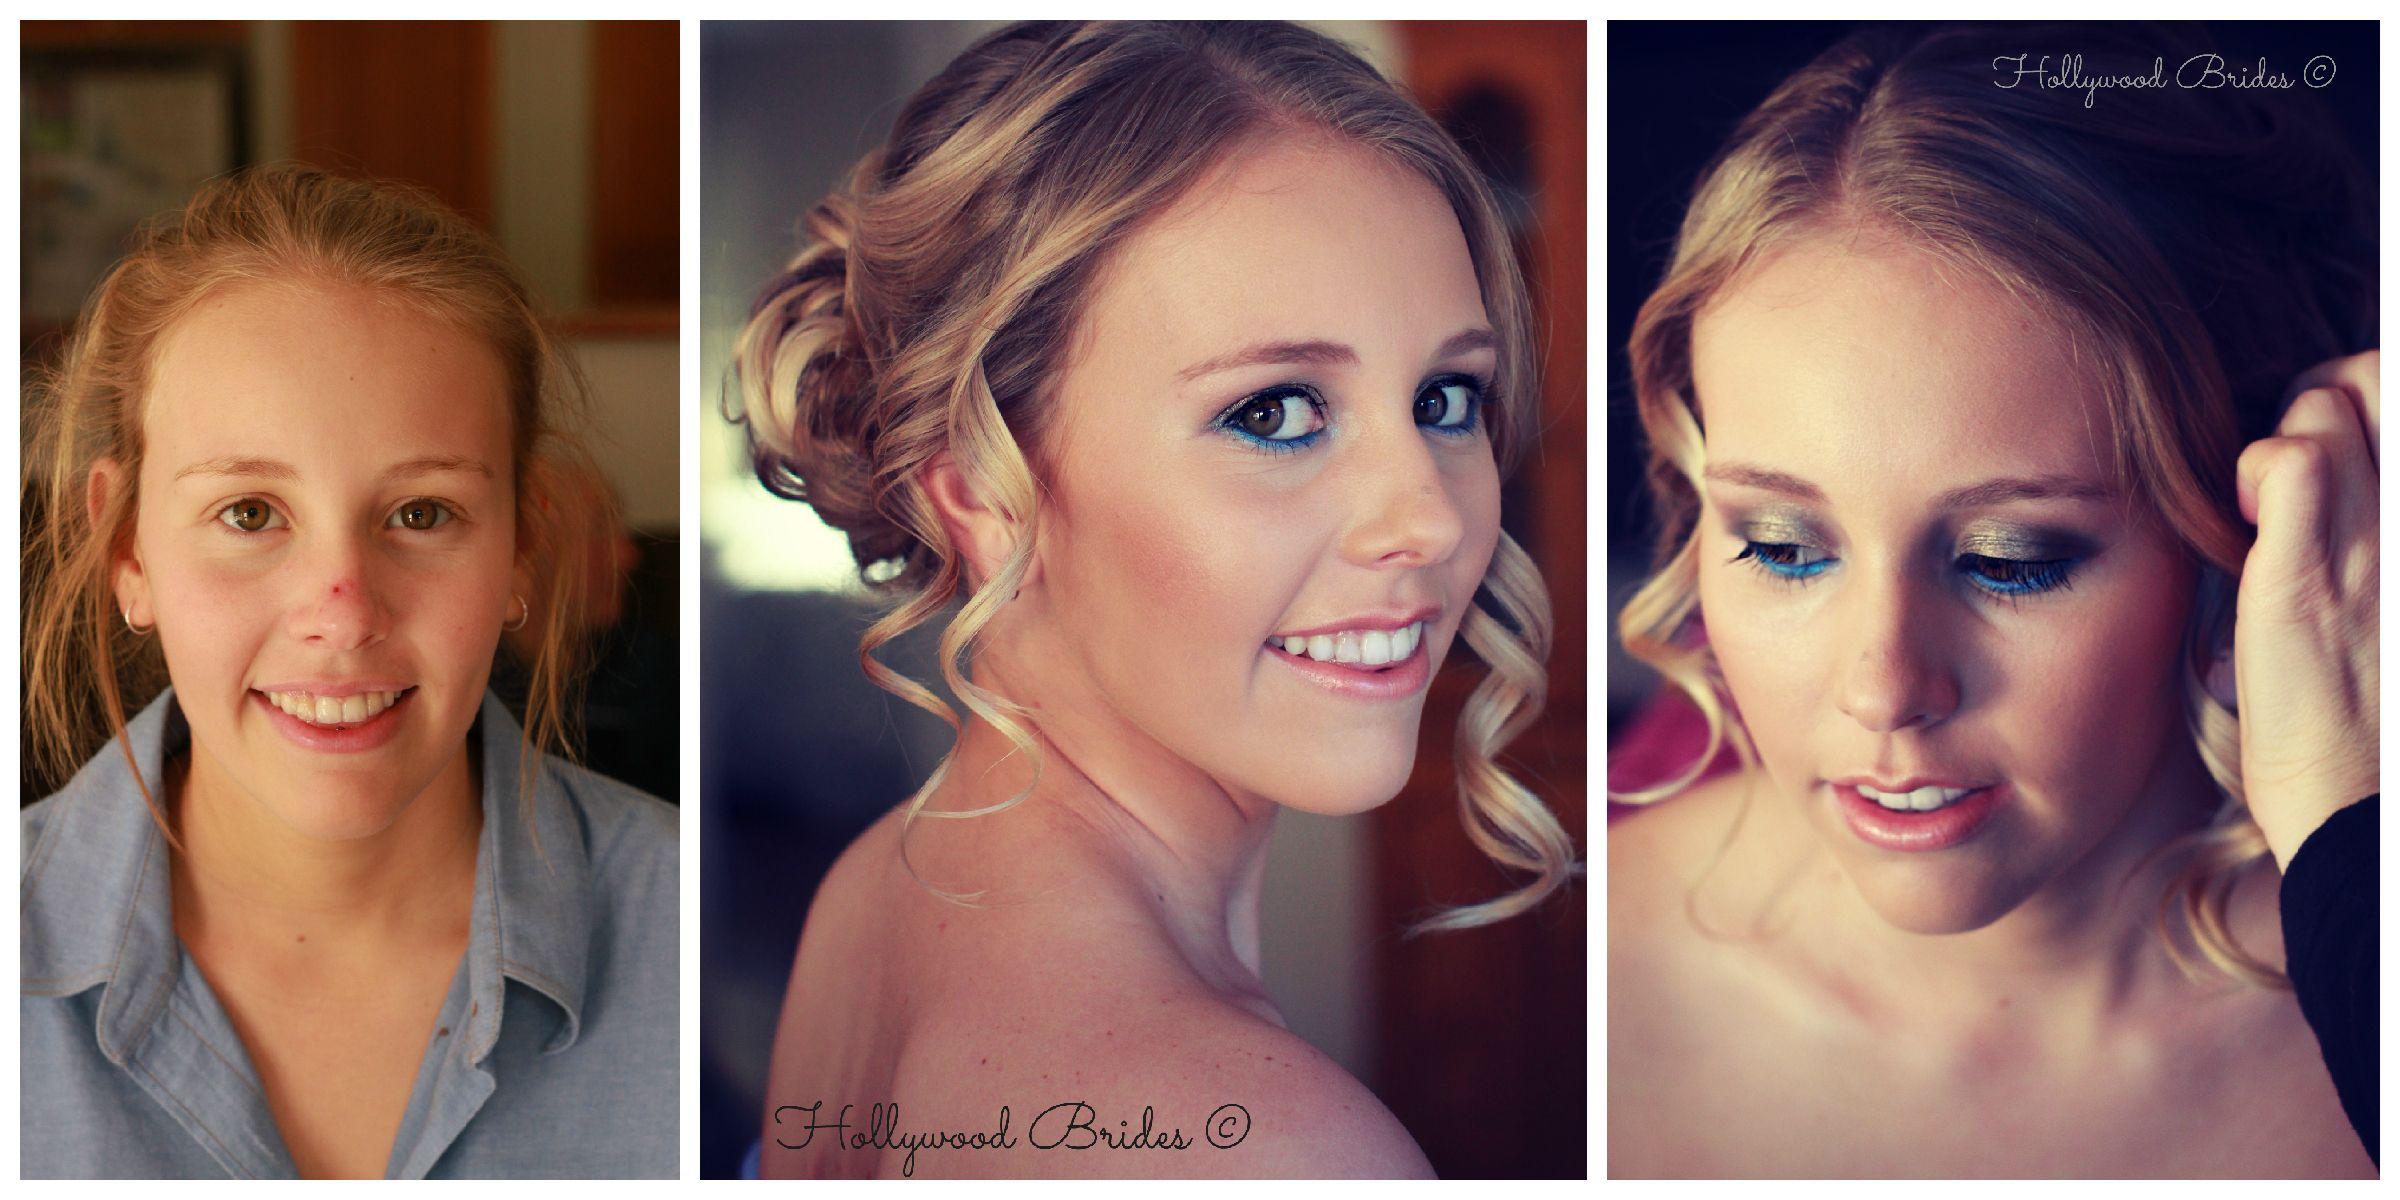 Boho hair makeup & photography from Hollywood brides Brisbane